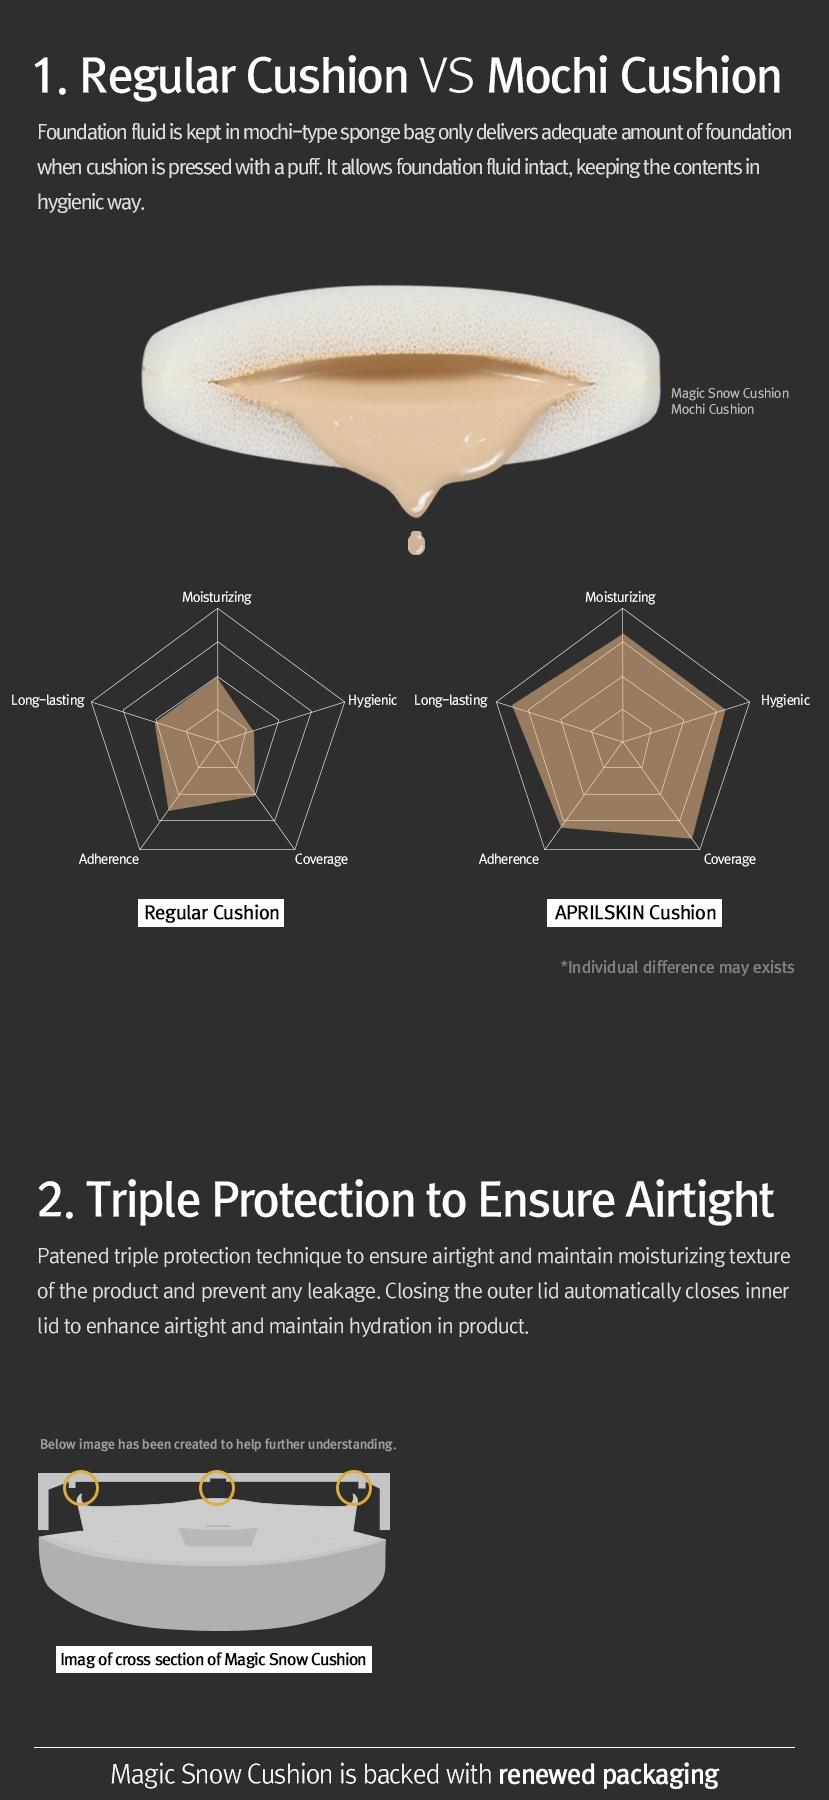 Buy April Skin Magic Snow Cushion Black Deals For Only Rp279000 Versi 20 21 Light Beige 22 Pink 23 Natural